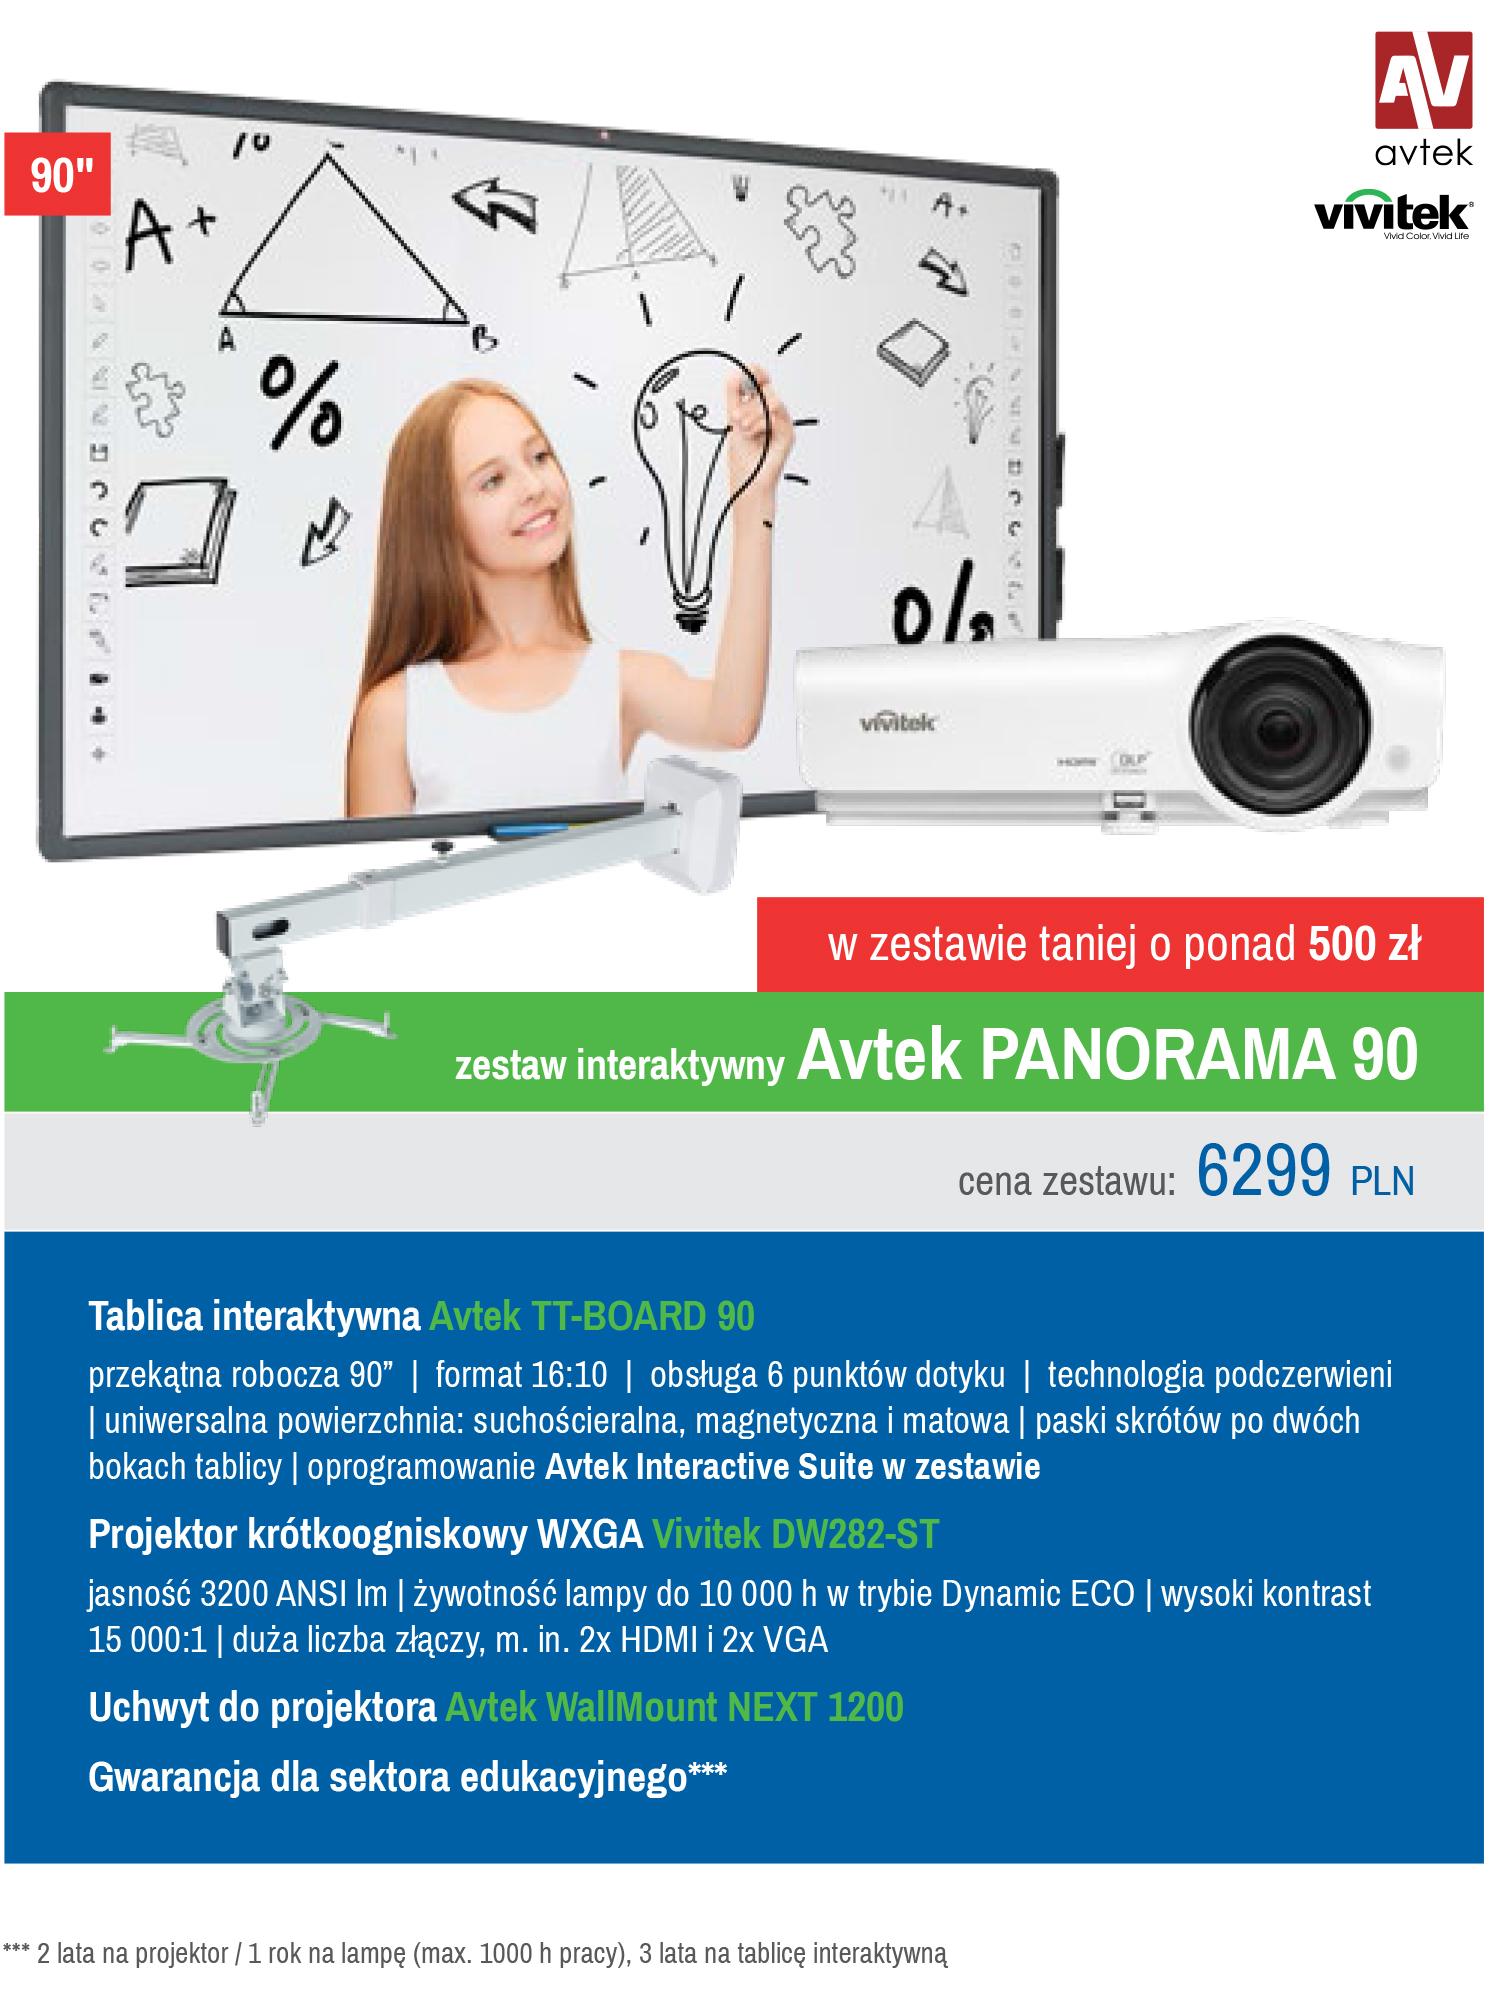 avtek-panorama-90